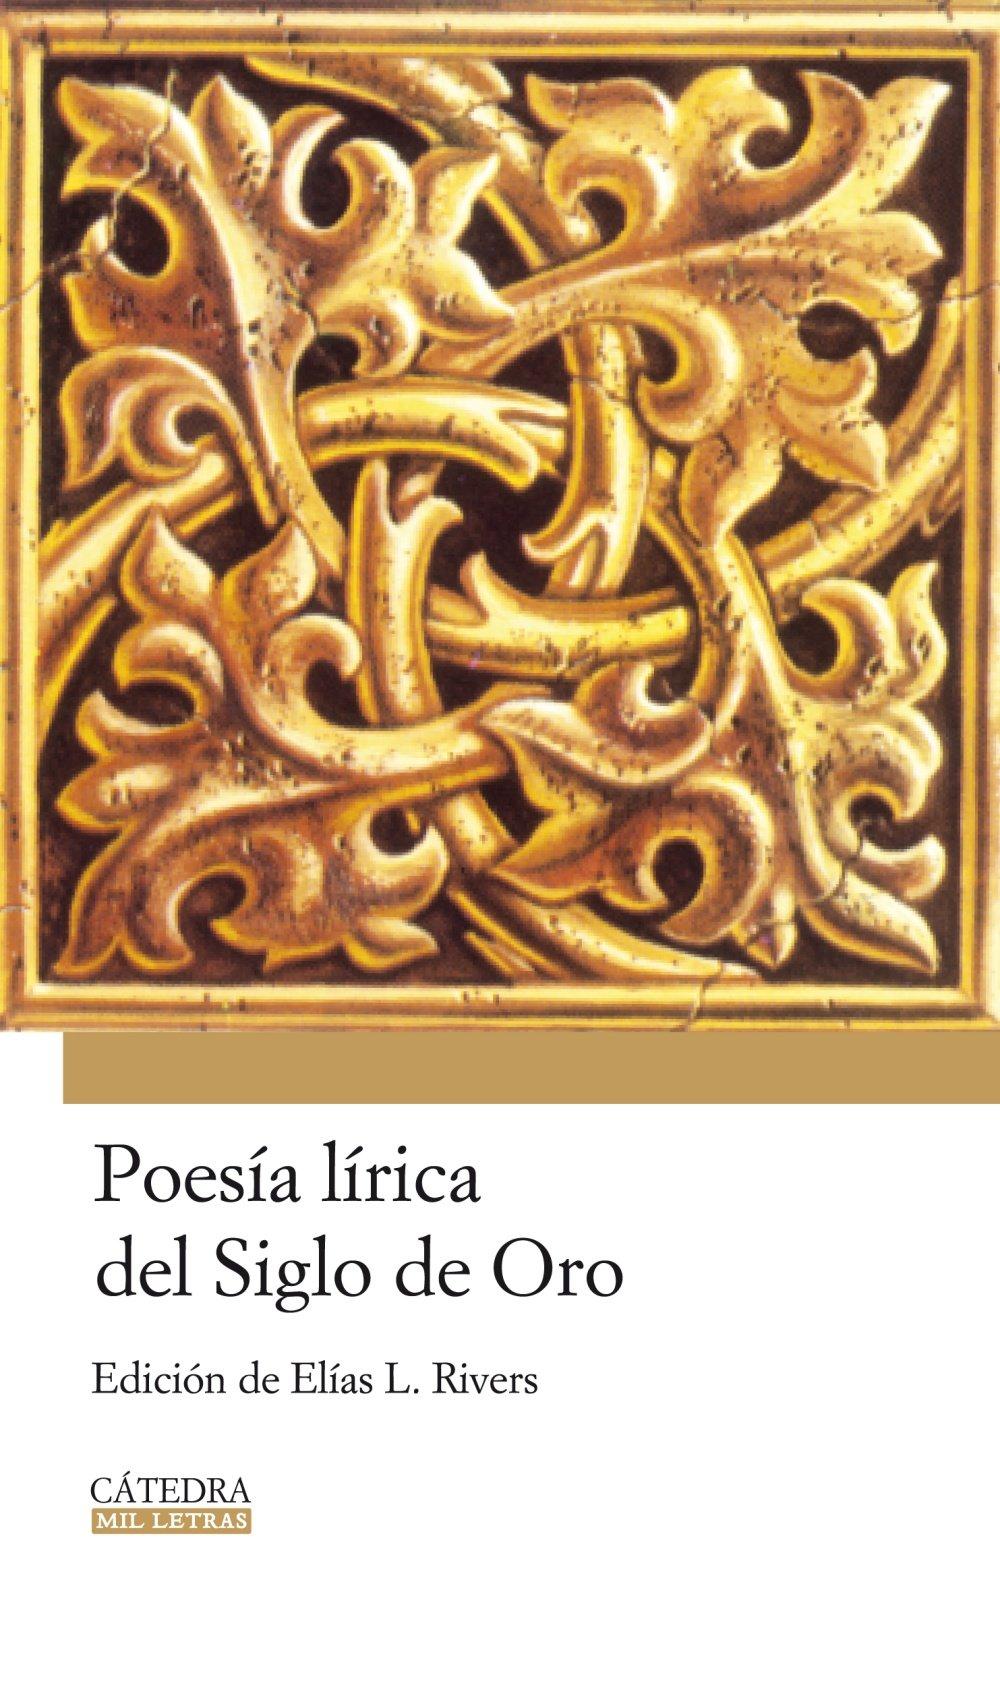 Poesia lirica del Siglo de Oro/ Lyric Poetry of the Golden Age (Mil letras/ 1000 Words) (Spanish Edition) pdf epub